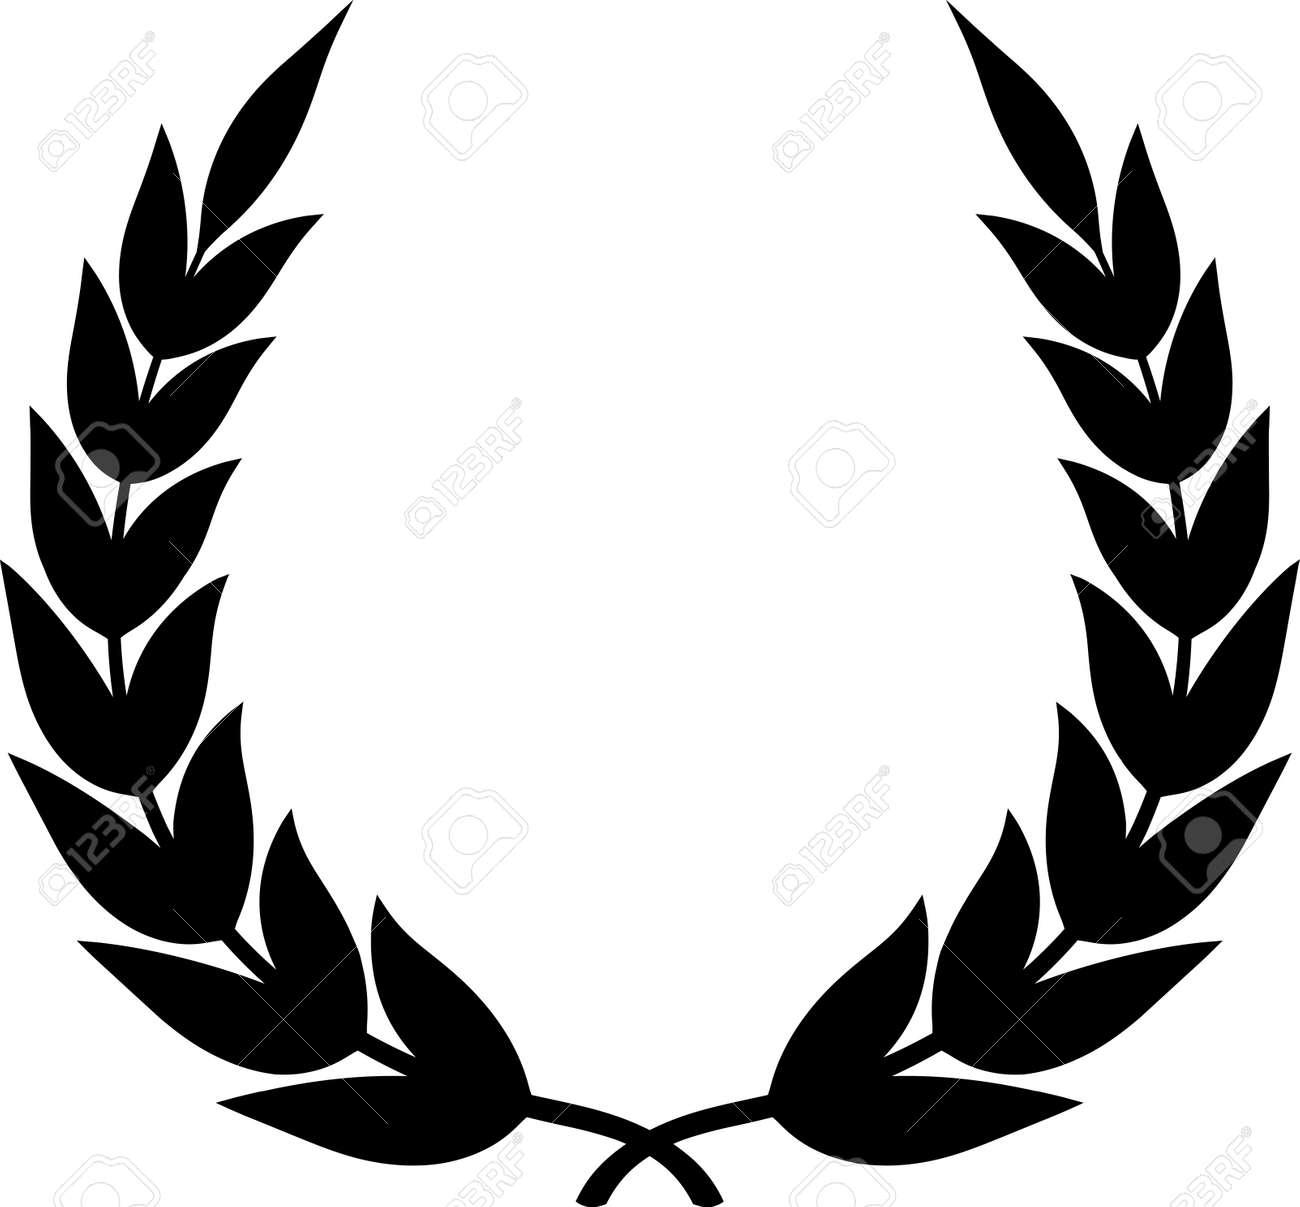 Vector illustration - Laurel wreath isolated on white Stock Vector - 13628555